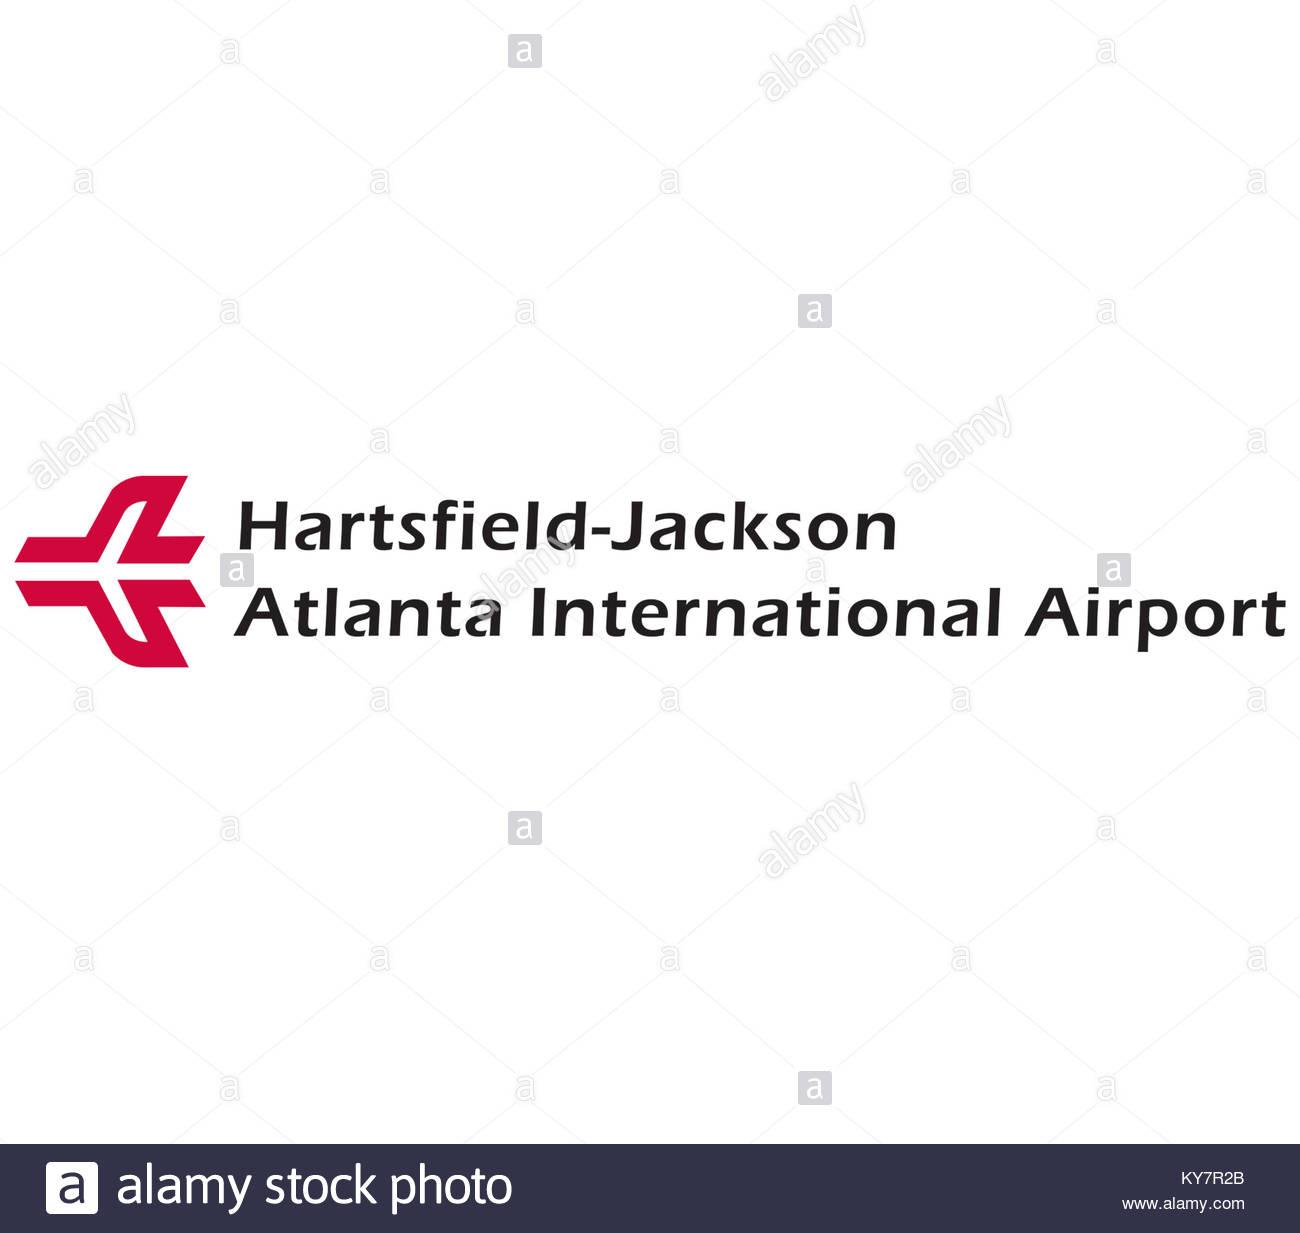 Hartsfield Jackson Atlanta International Airport logo icon - Stock Image